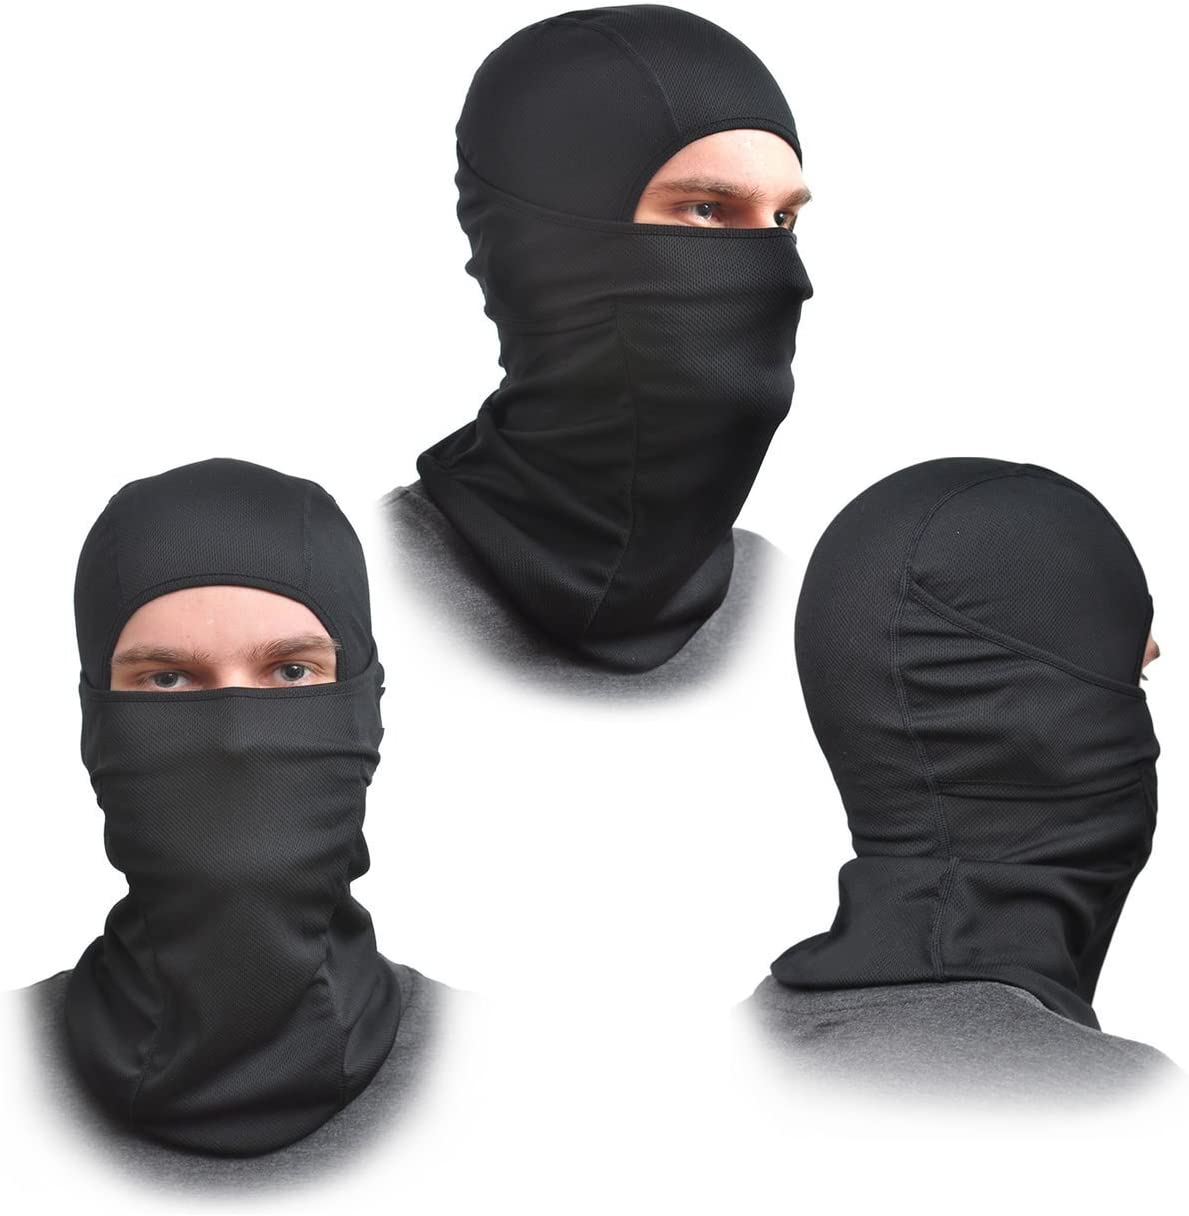 One Size Fits All AFA Tooling Balaclava Head Sock 2-pack